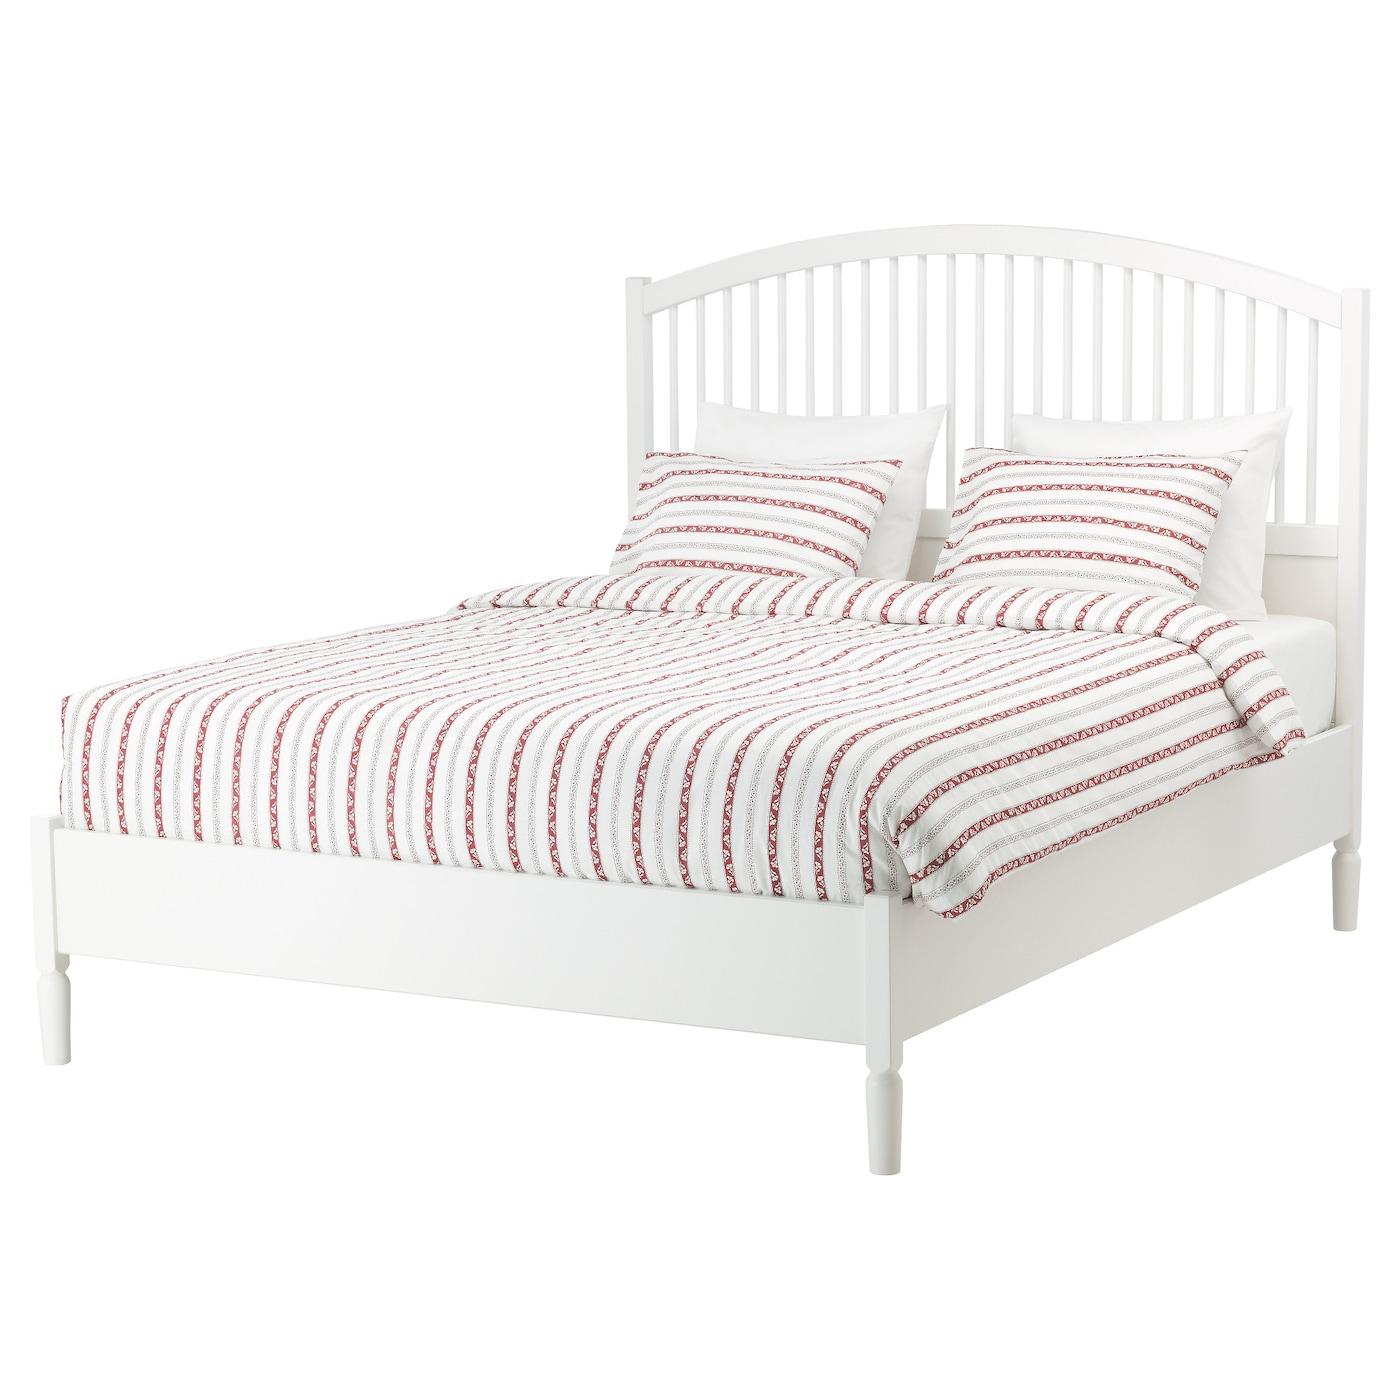 TYSSEDAL Bed frame Whitelury Standard Double IKEA